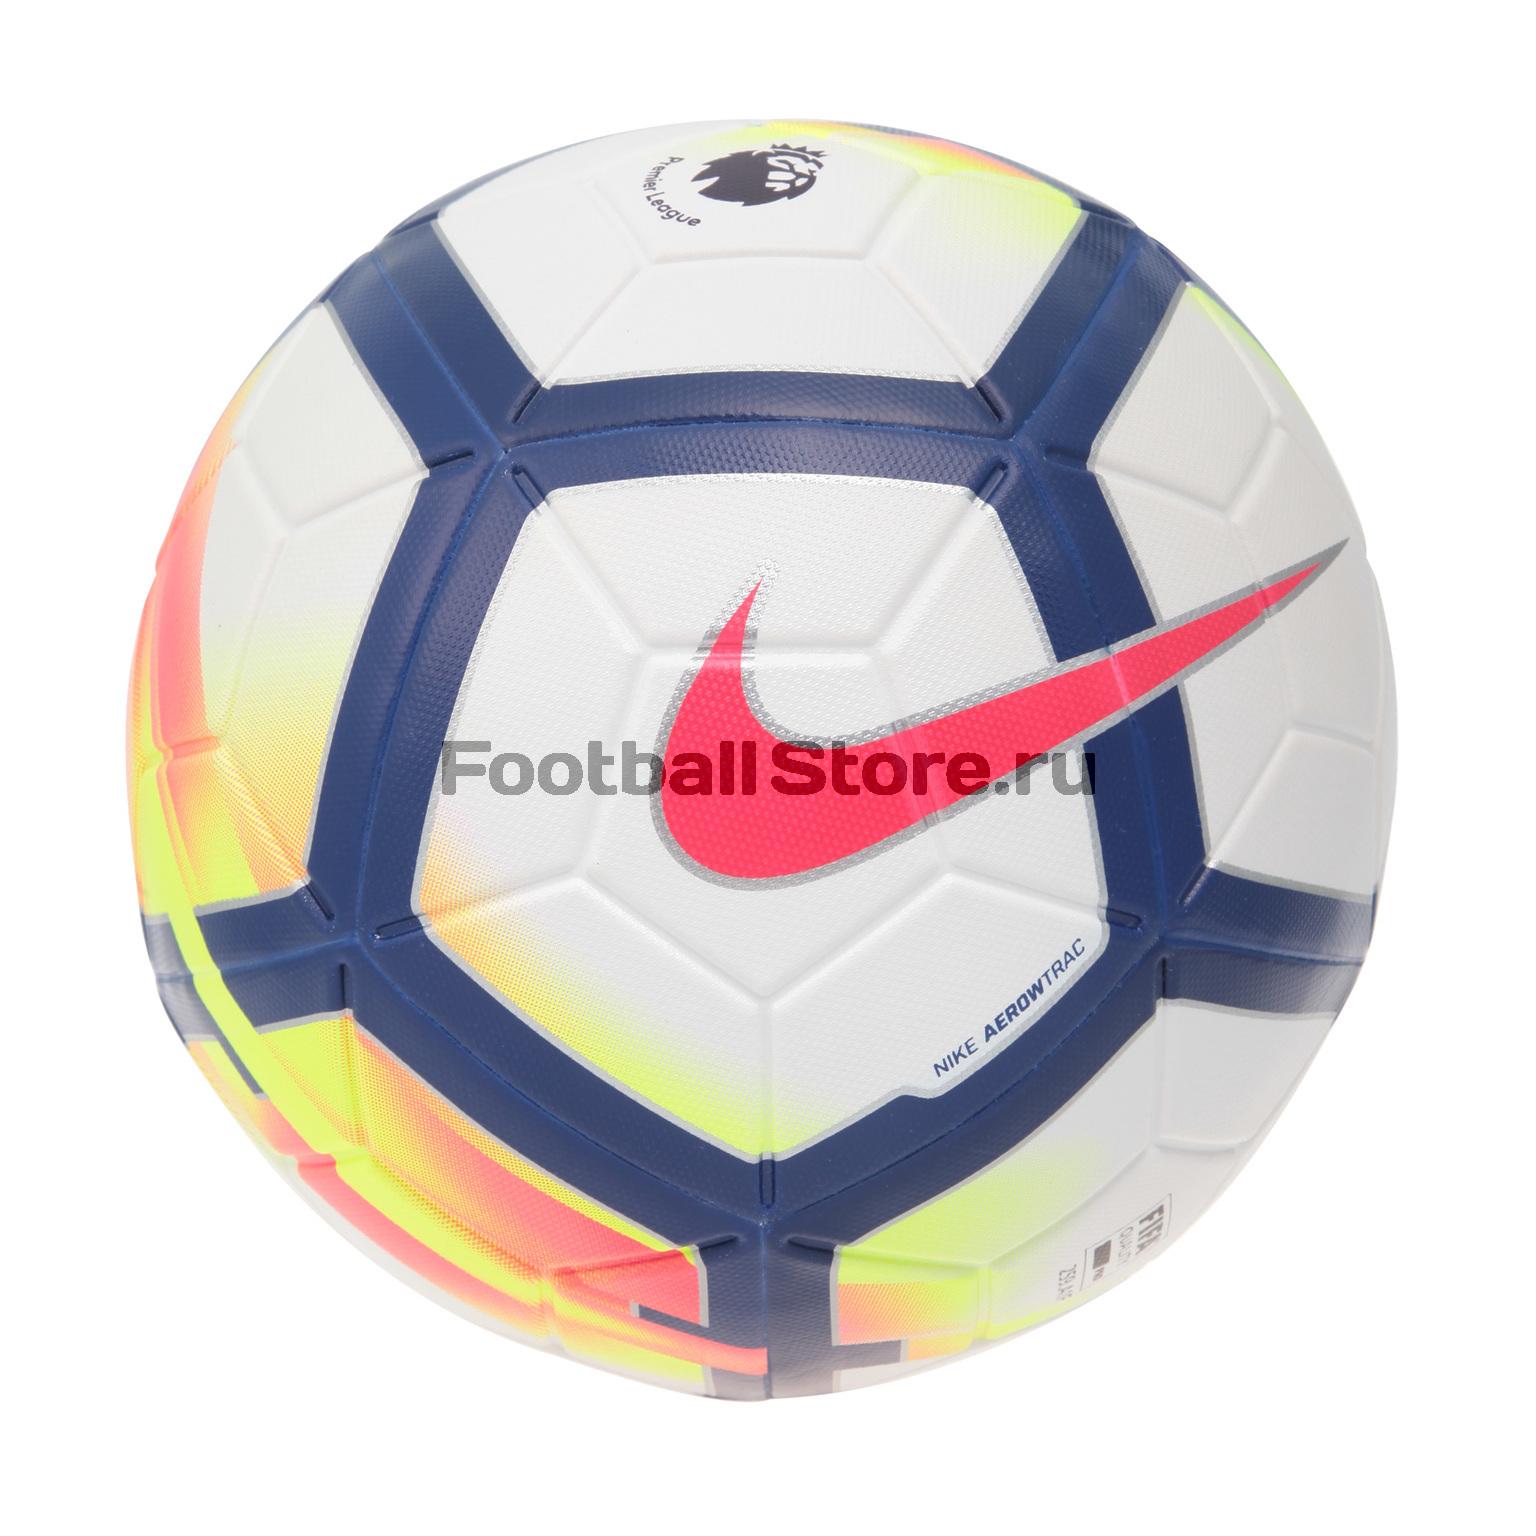 Футбольный мяч Nike Premier League Magia SC3160-100 мяч футбольный nike premier х sc3092 102 р 4 fifa quality pro